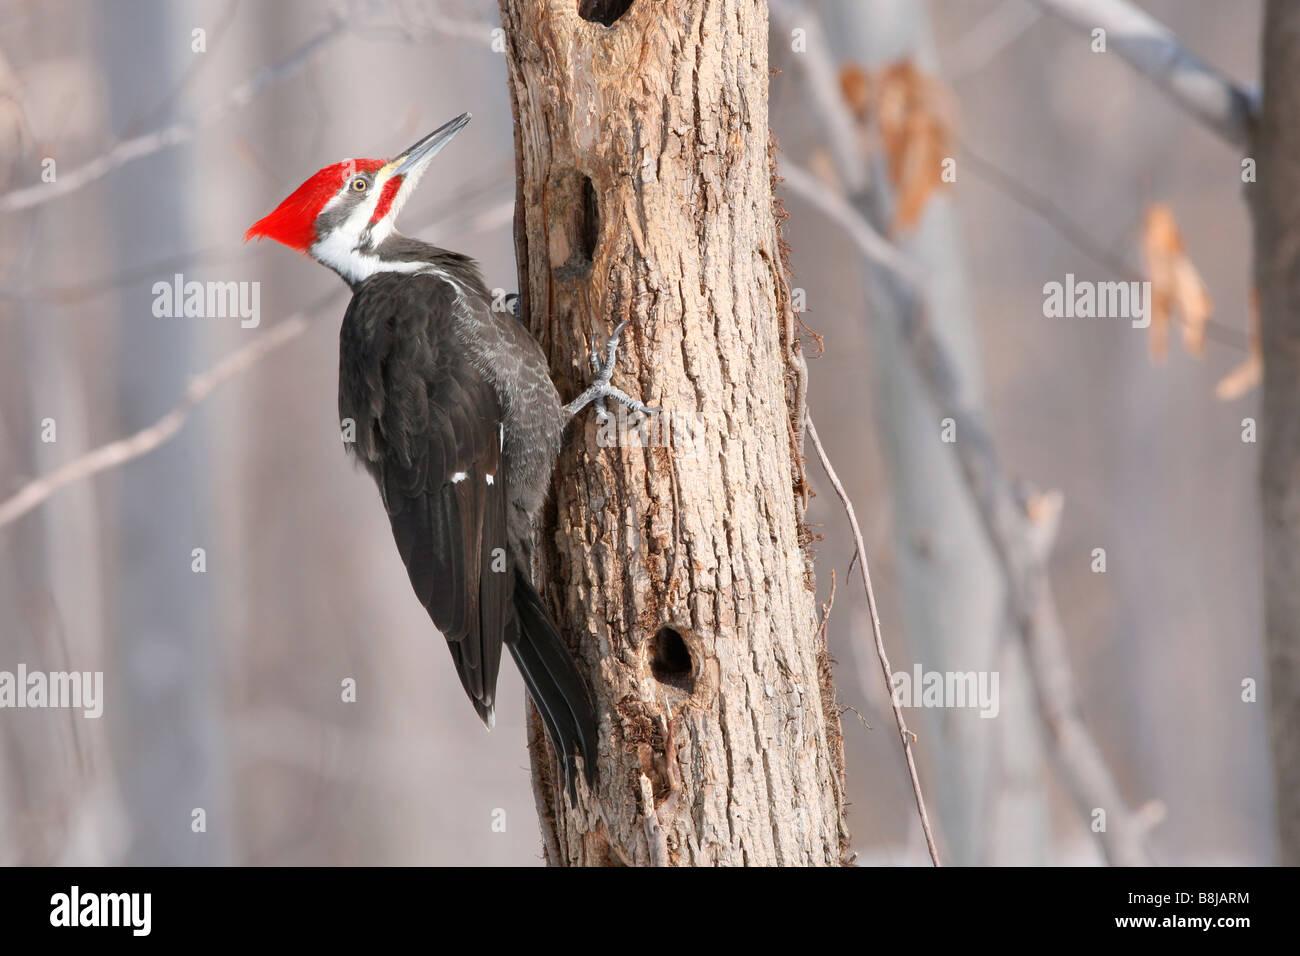 Pileated Woodpecker - Stock Image